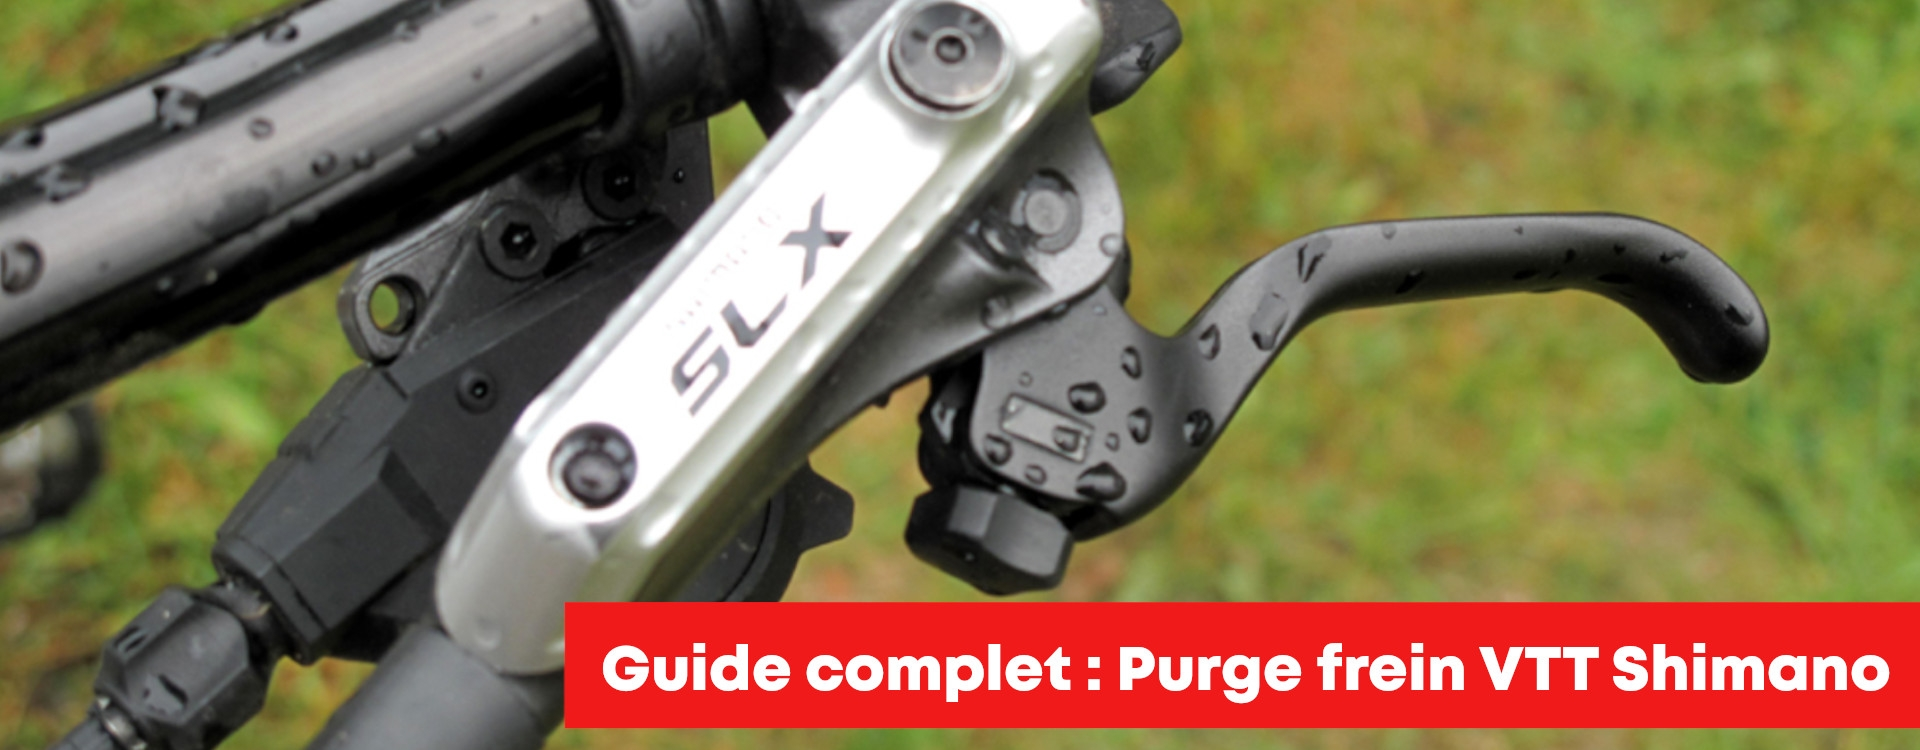 Purge frein VTT Shimano XTR, XT, SLX et Deore étape par étape !